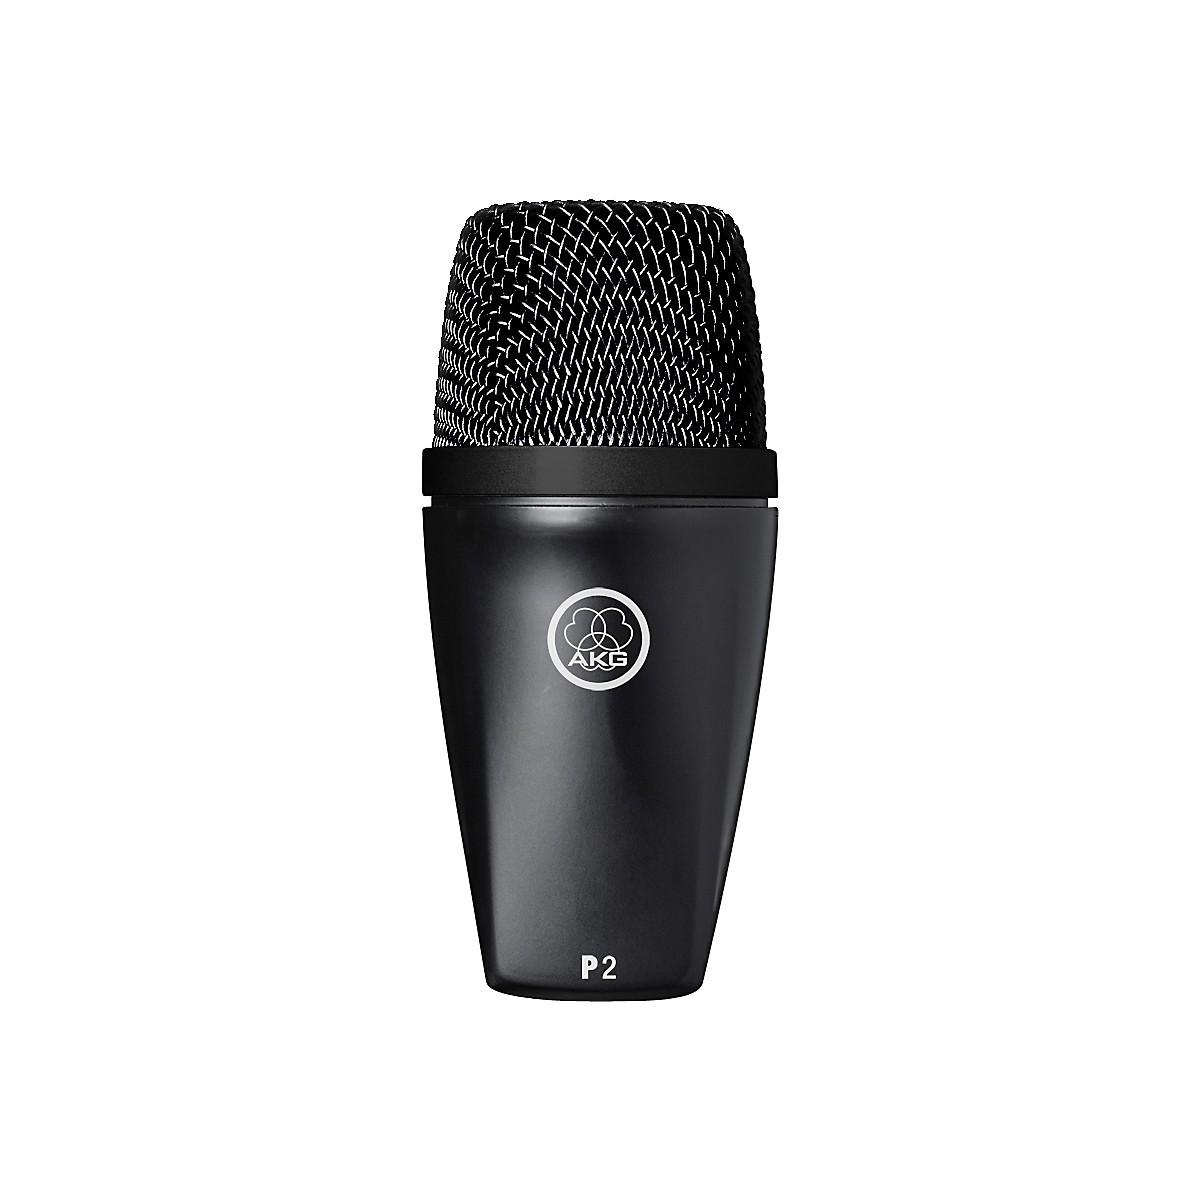 AKG P2 Dynamic Instrument Microphone